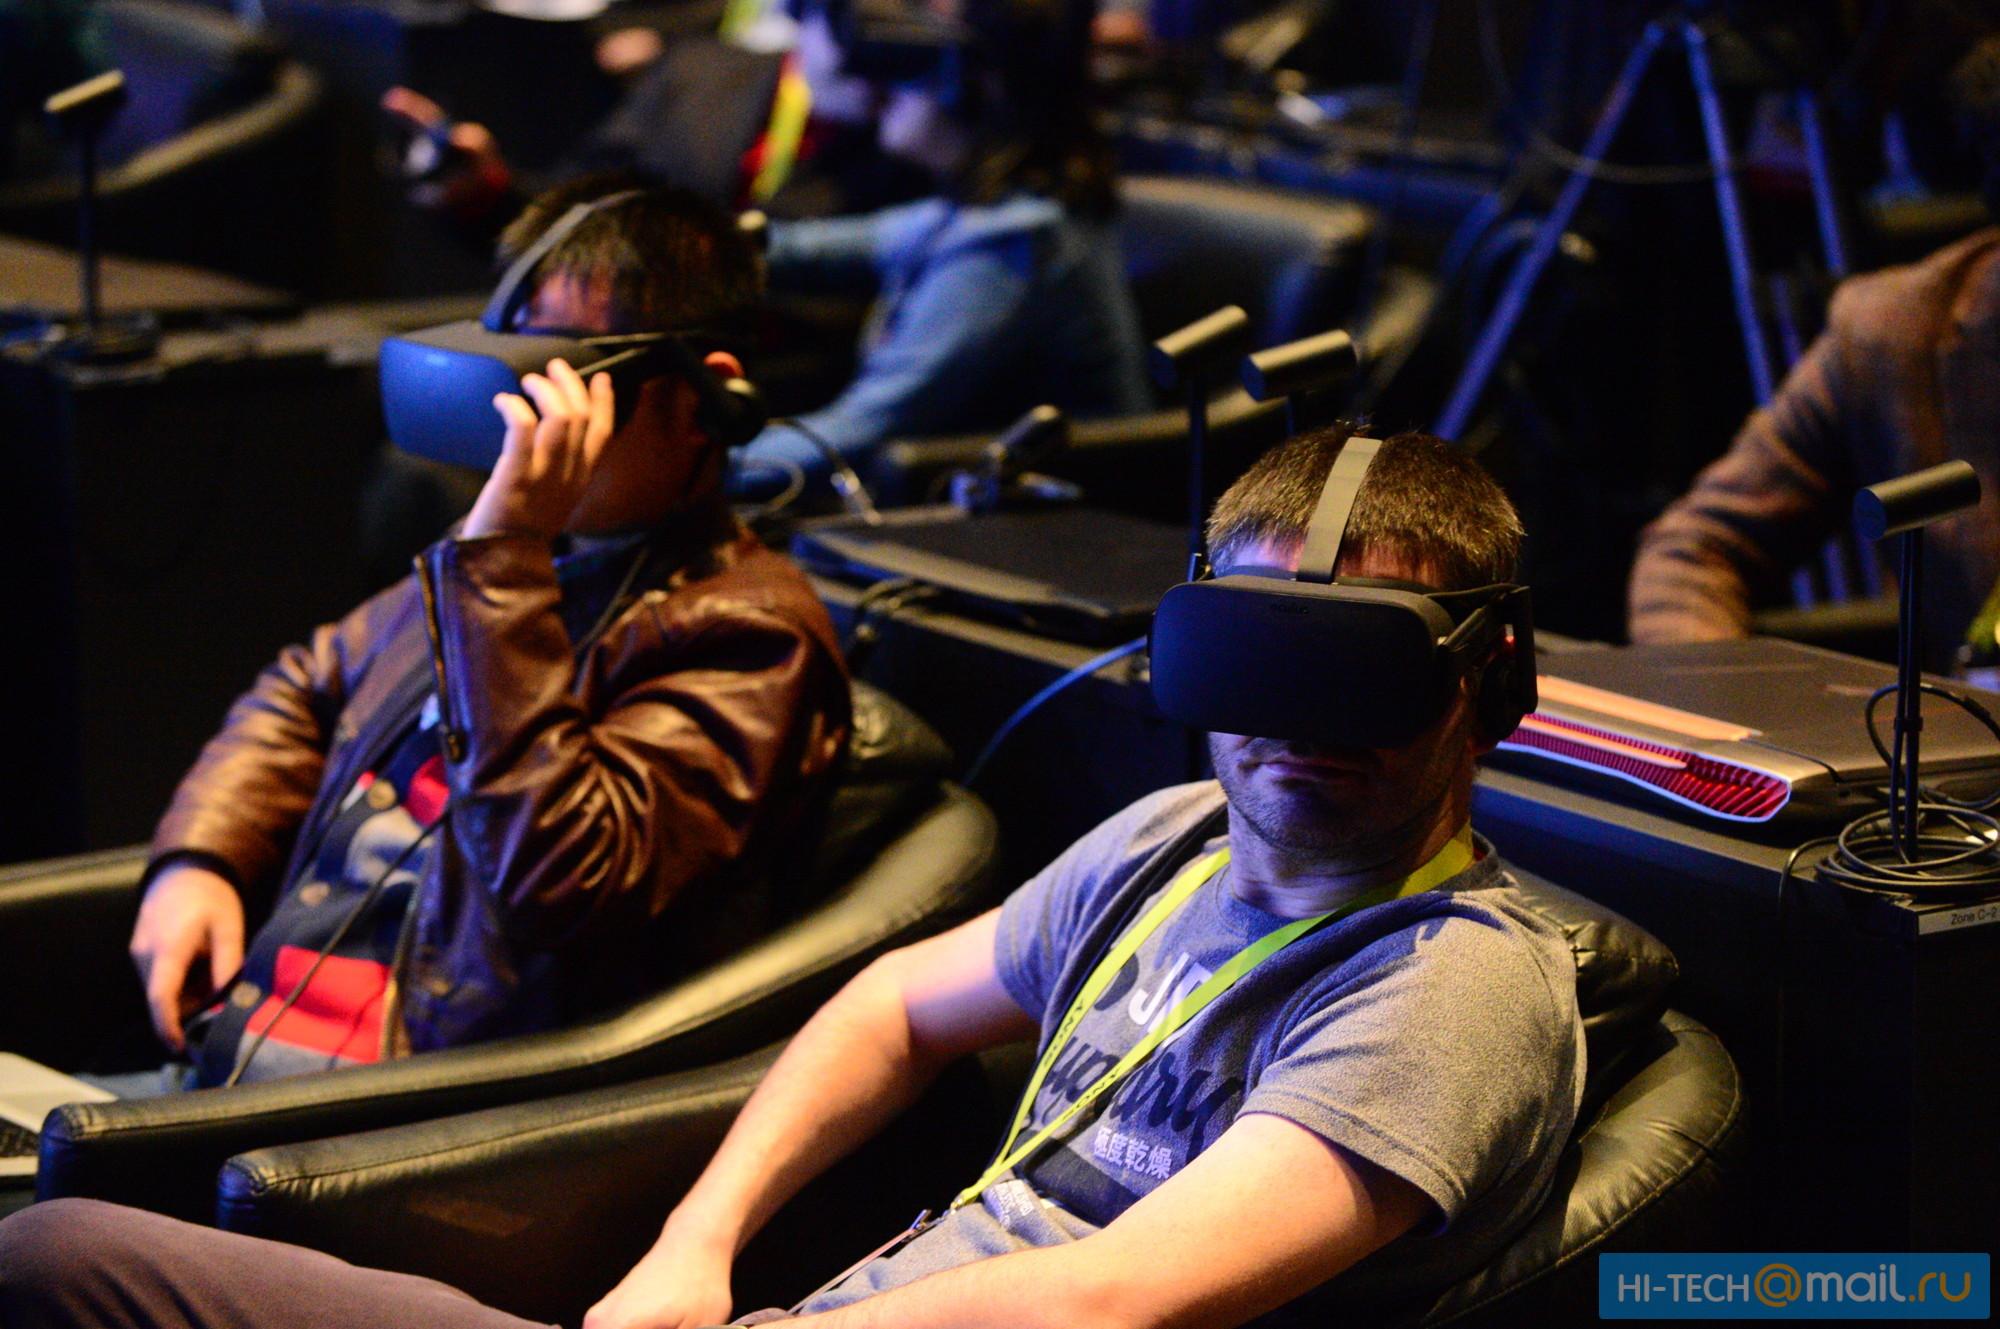 VR glasses CES 2017